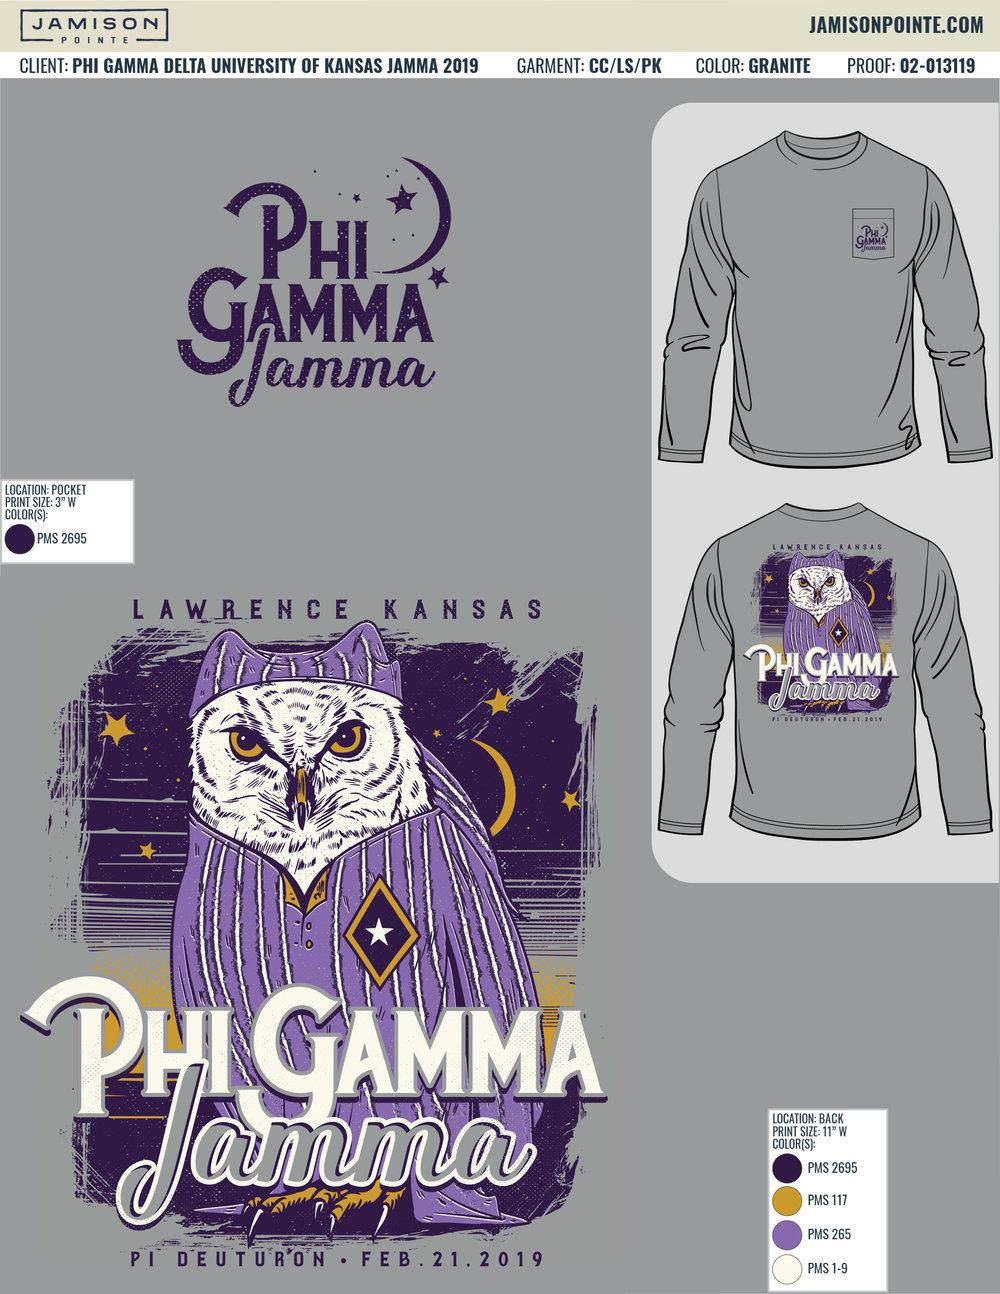 02-013119 Phi Gamma Delta University of Kansas Jamma 2019.jpg